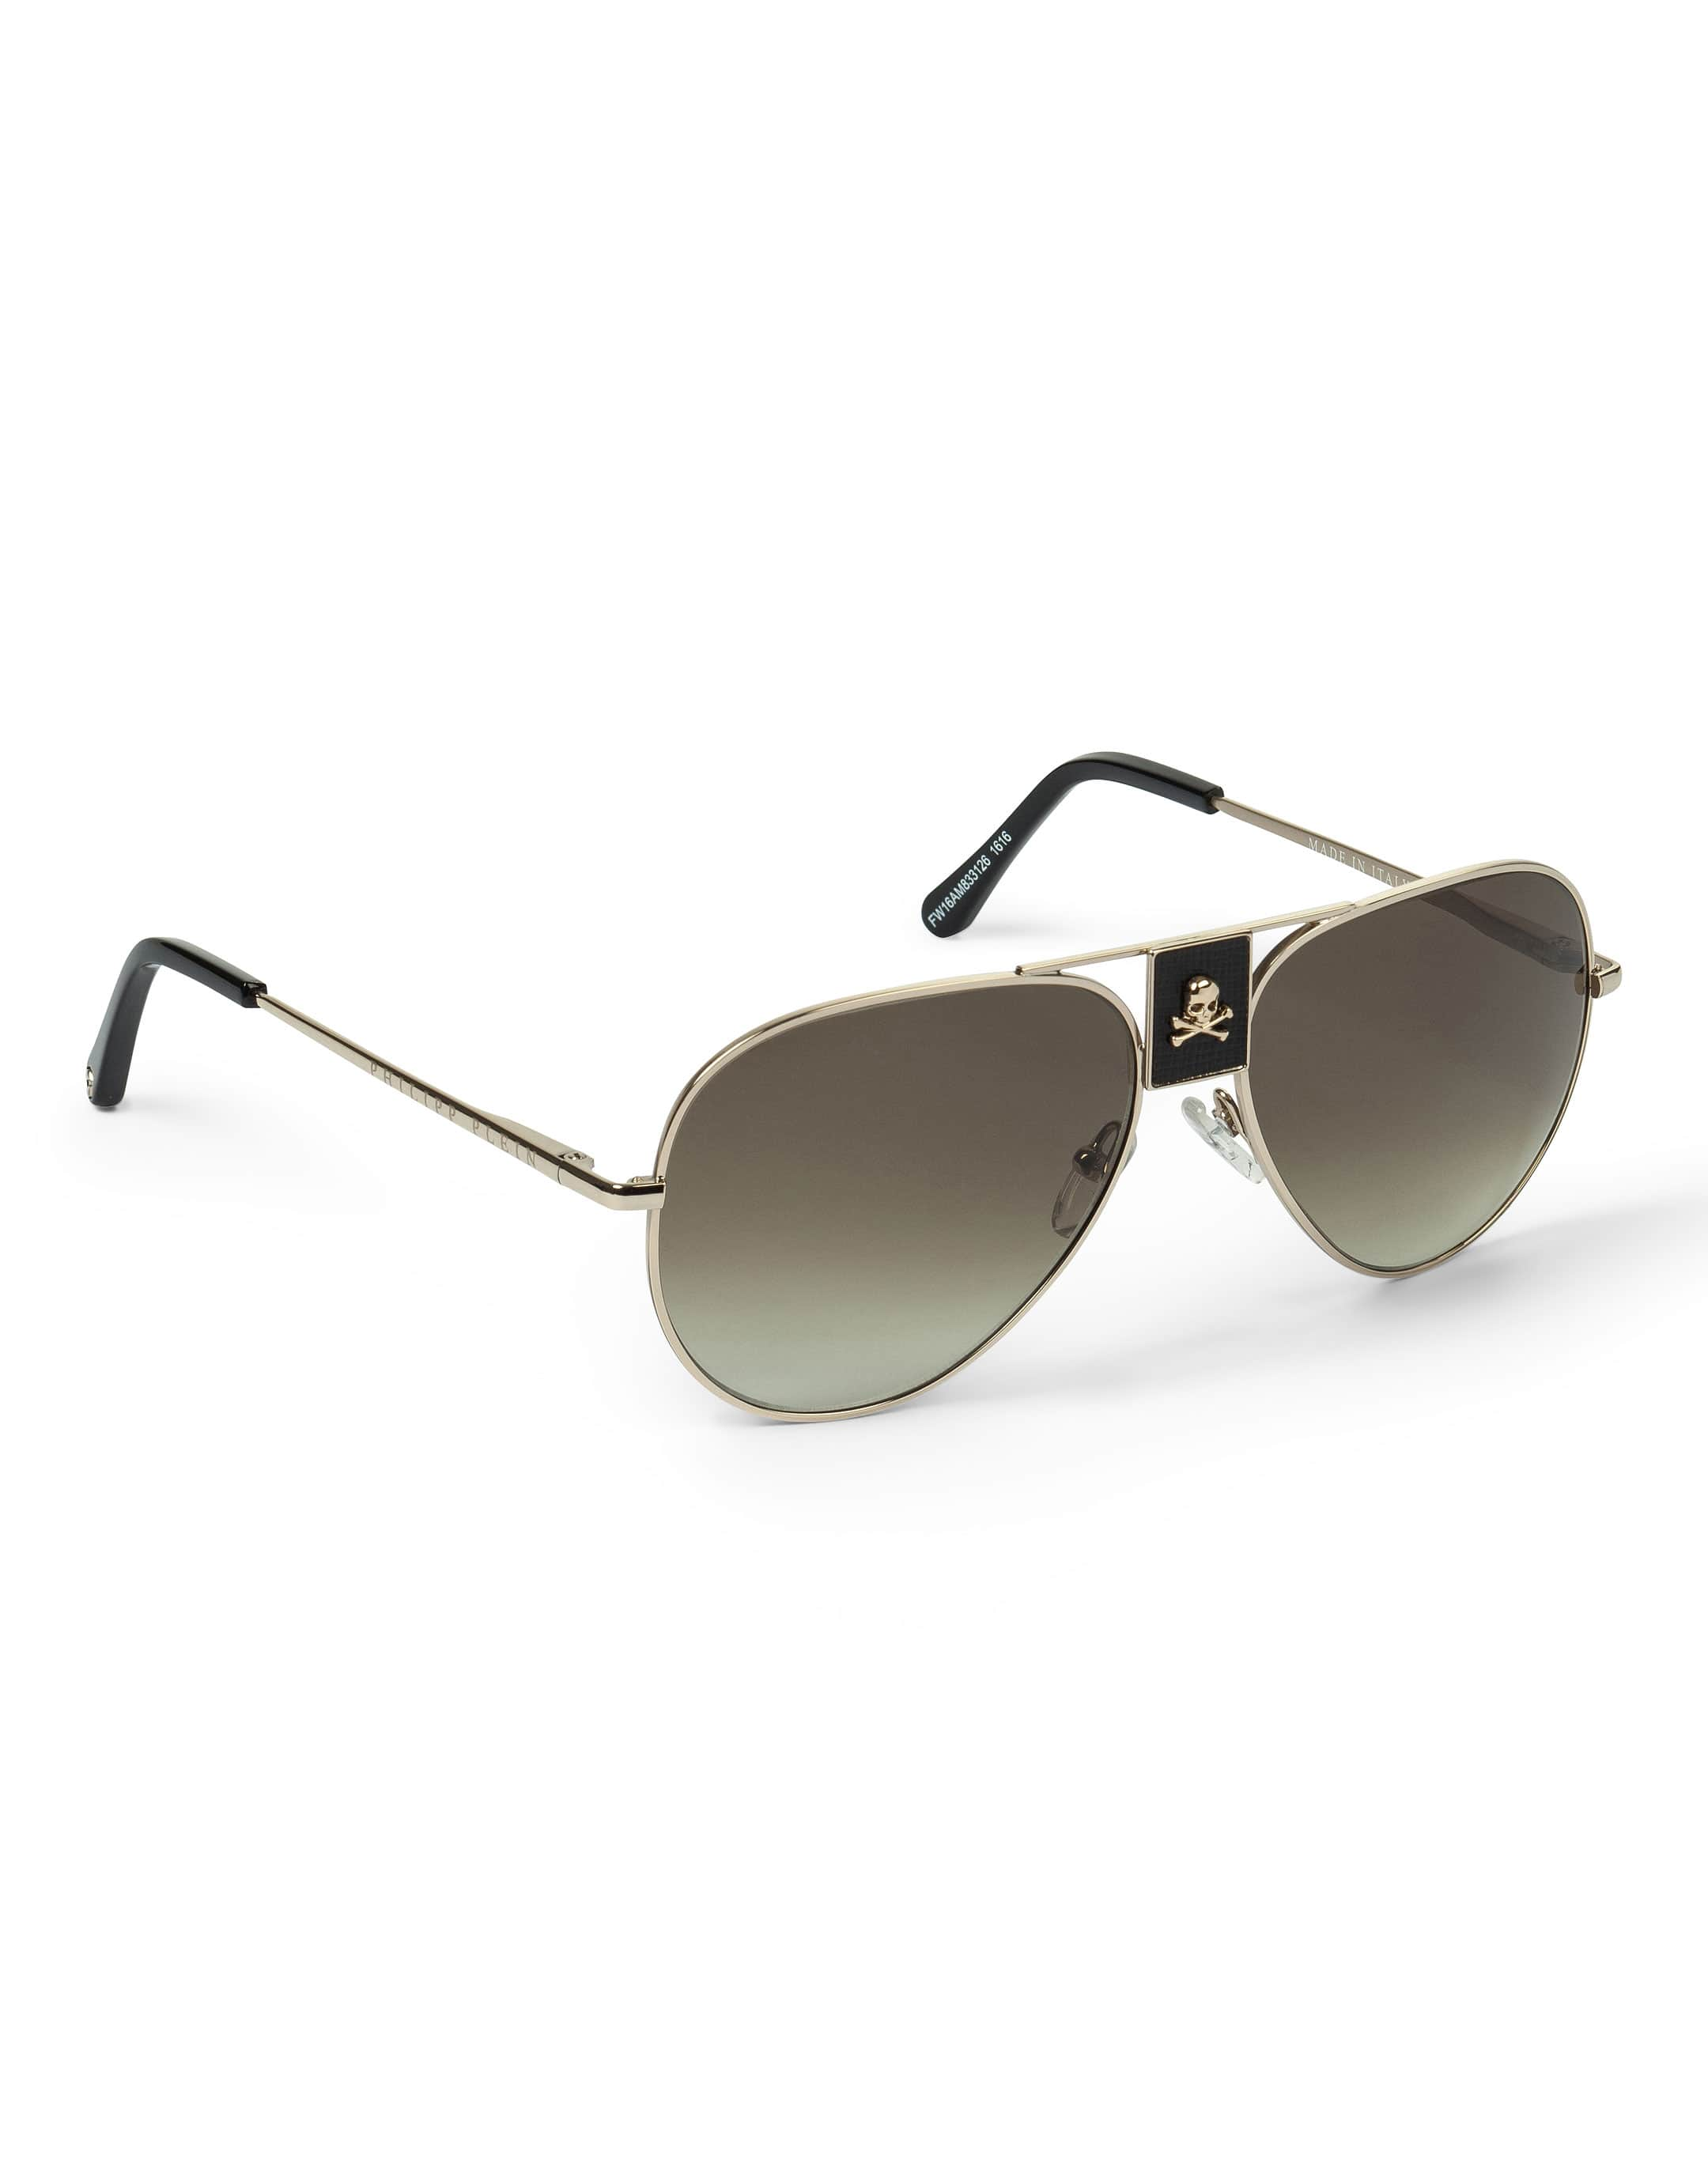 505d5bc11c Sunglasses